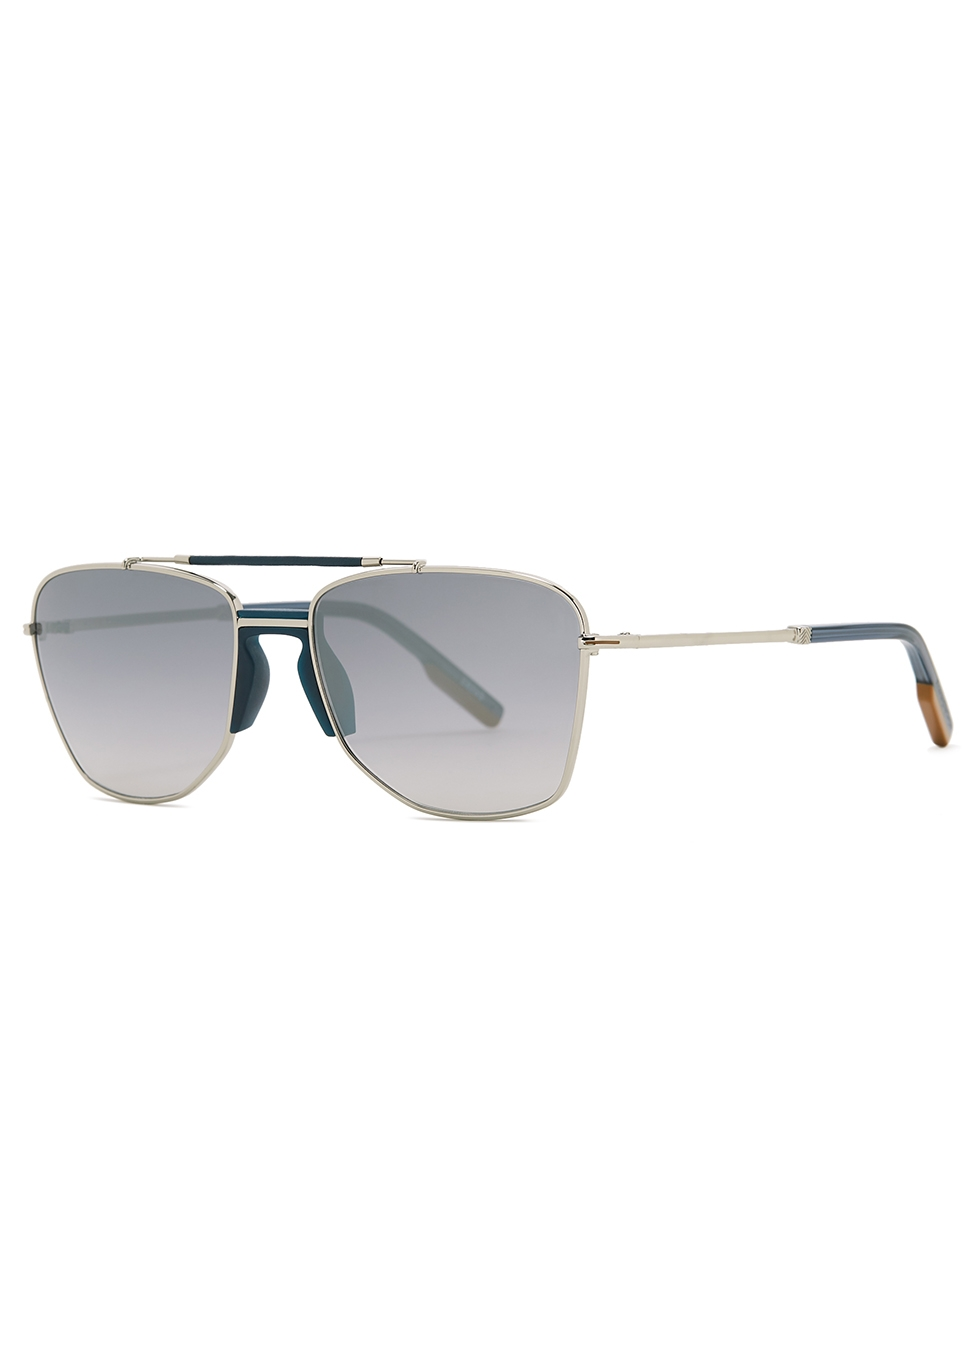 Silver-tone aviator-style sunglasses - Ermenegildo Zegna